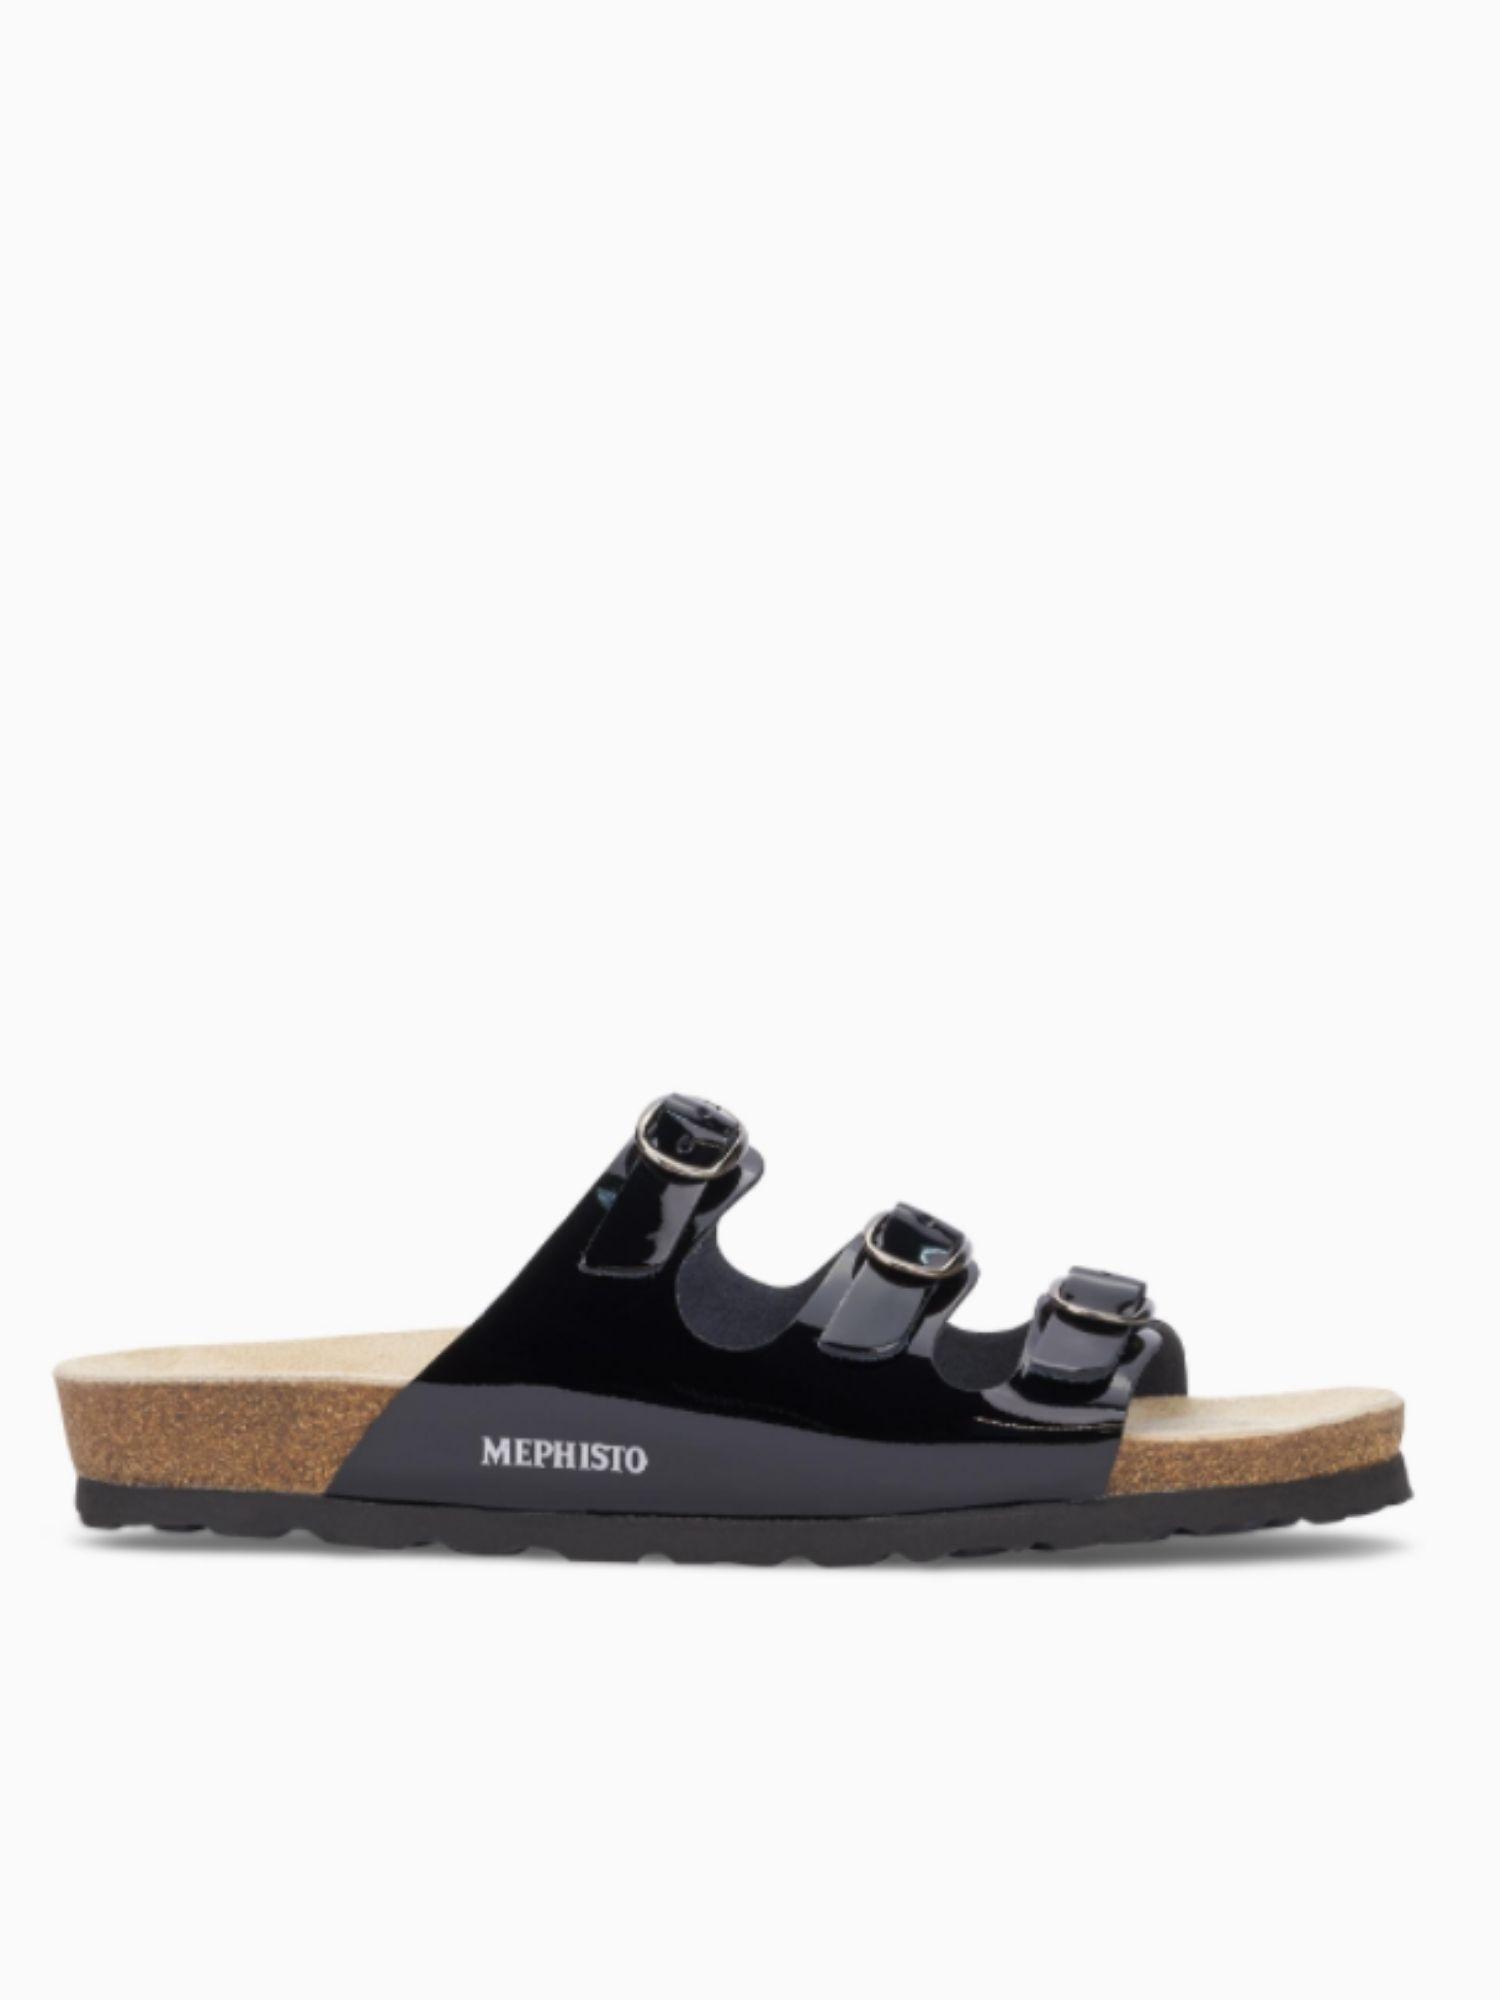 Sandalo Mephisto Nolene NERO laterale 1